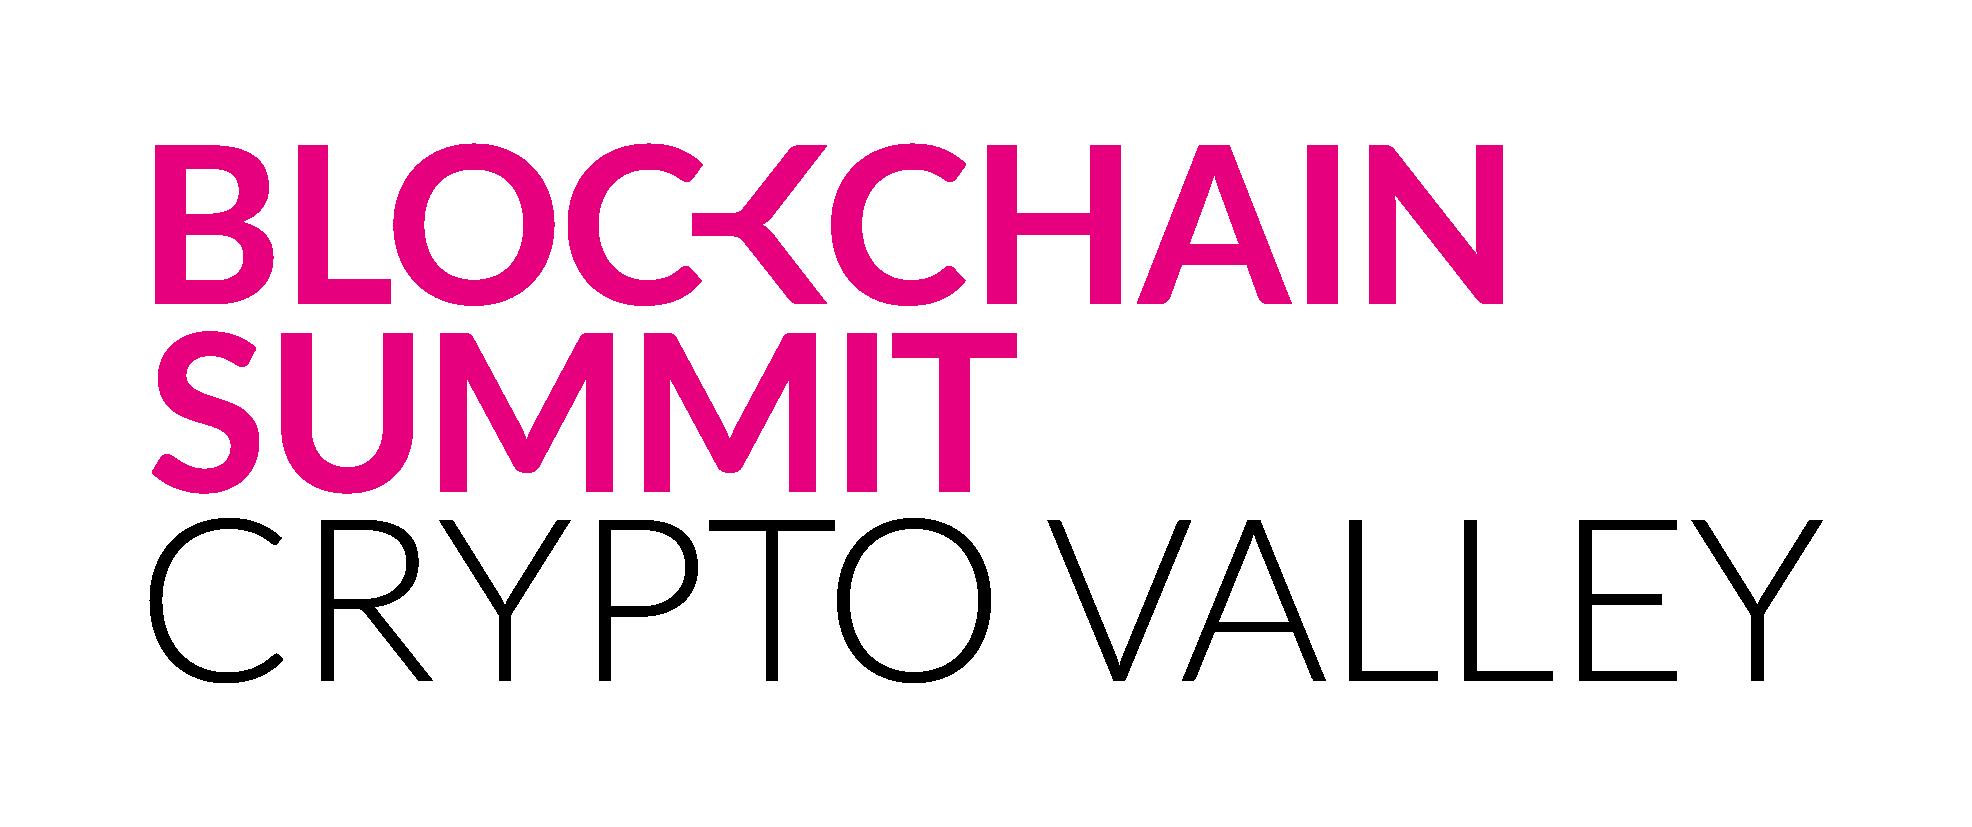 BlockchainSummit_Logo_pink.png